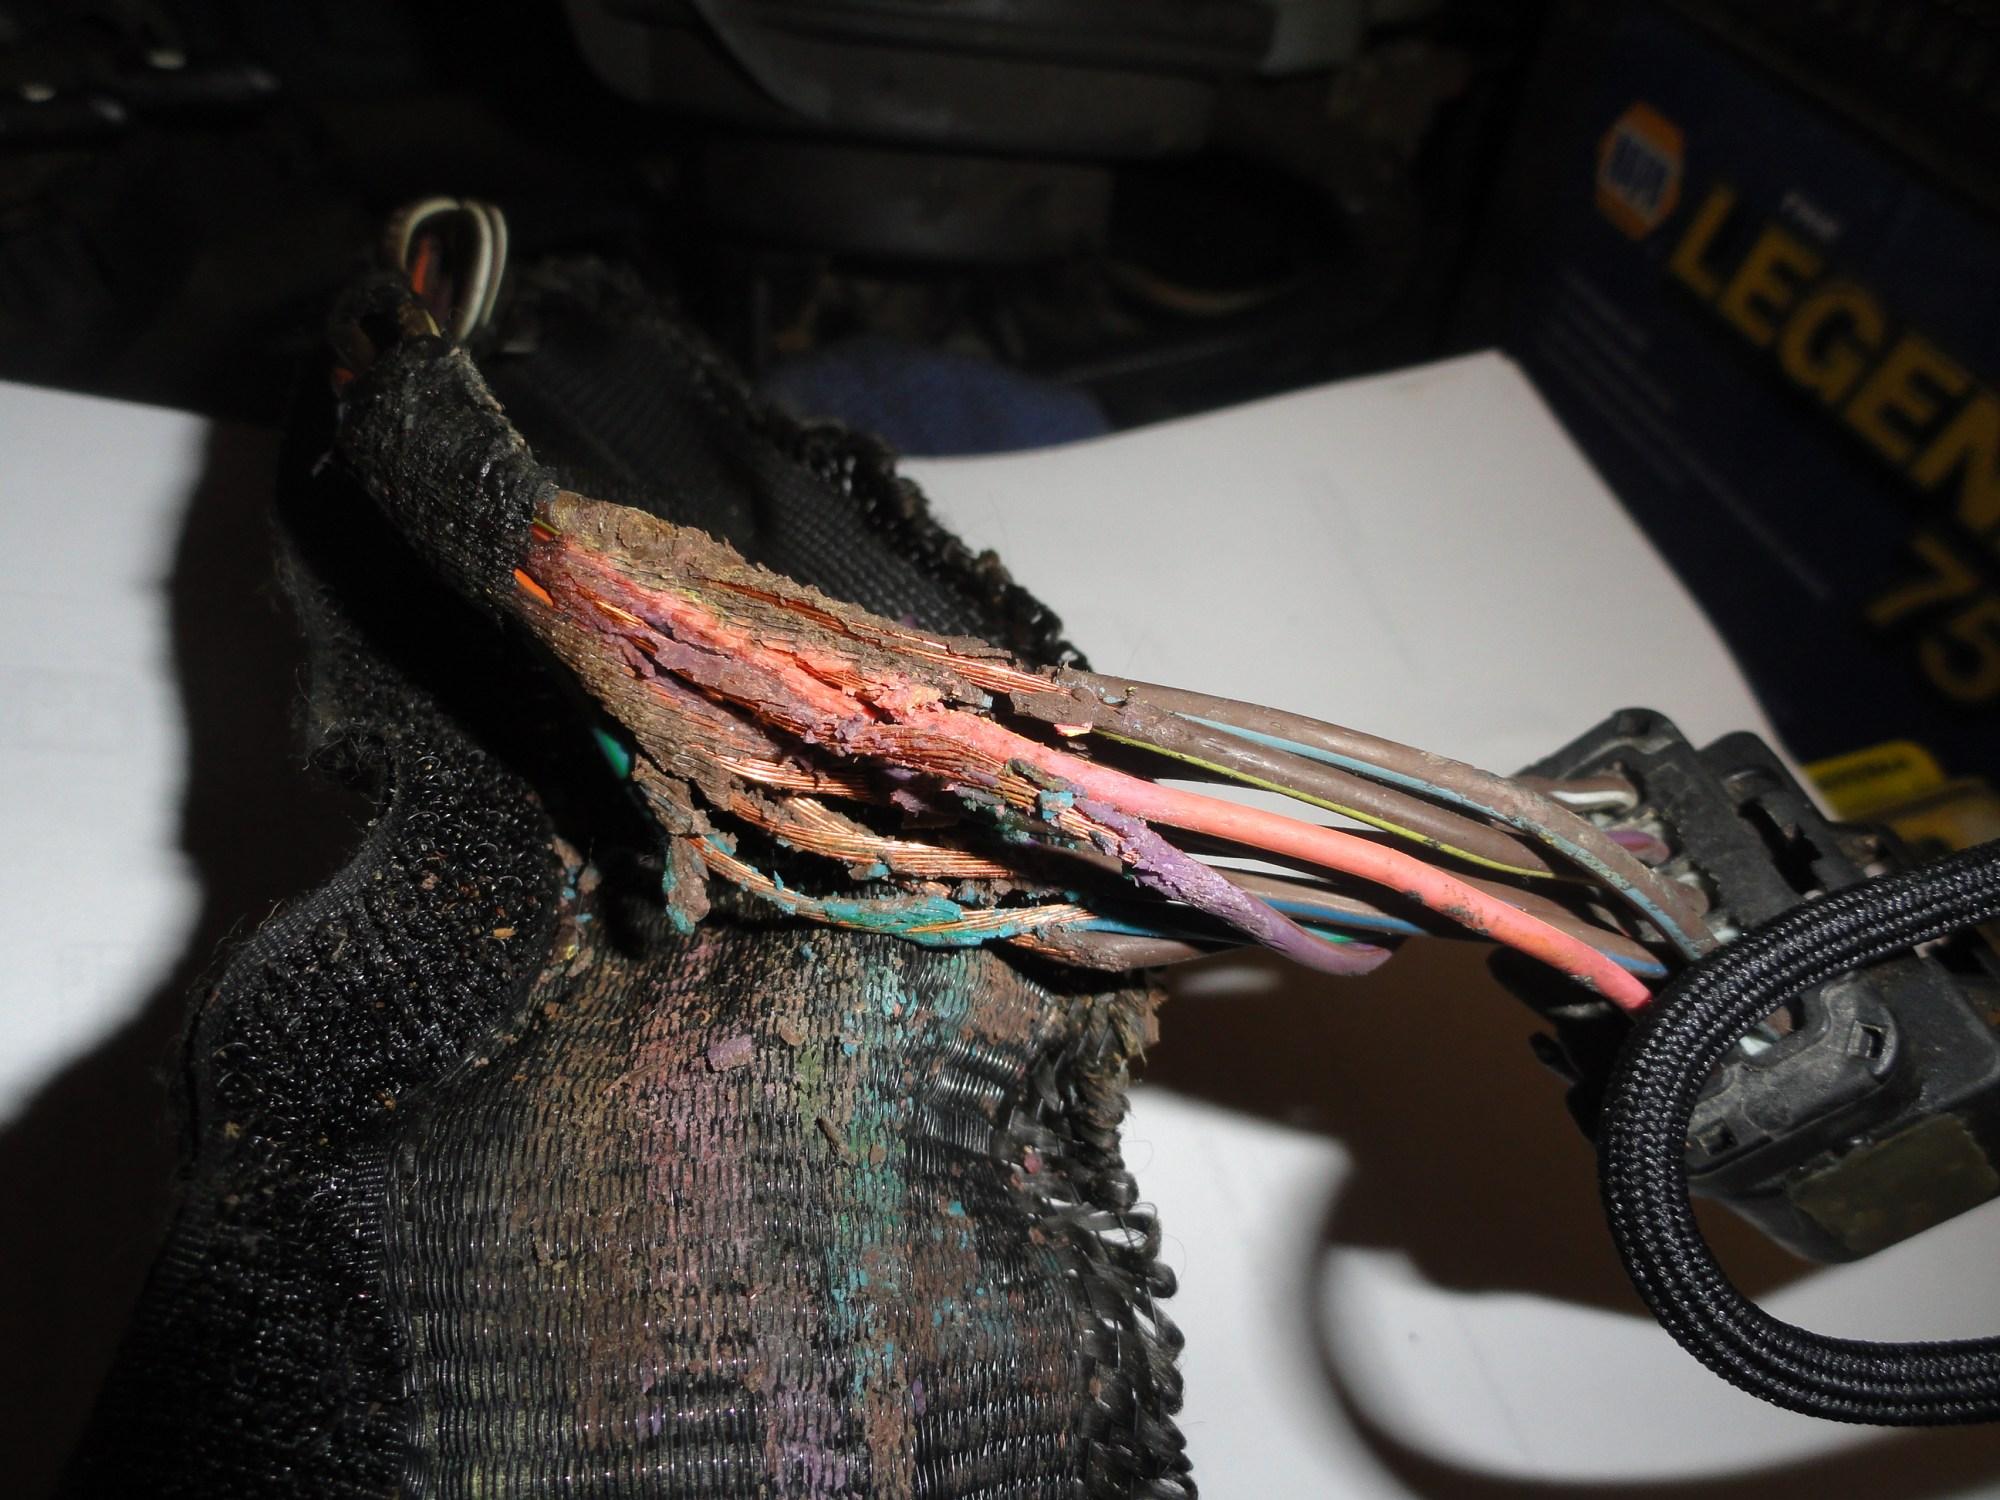 hight resolution of help needed repairing wiring harness automotive wiring 2002 dodge grand caravan wiring